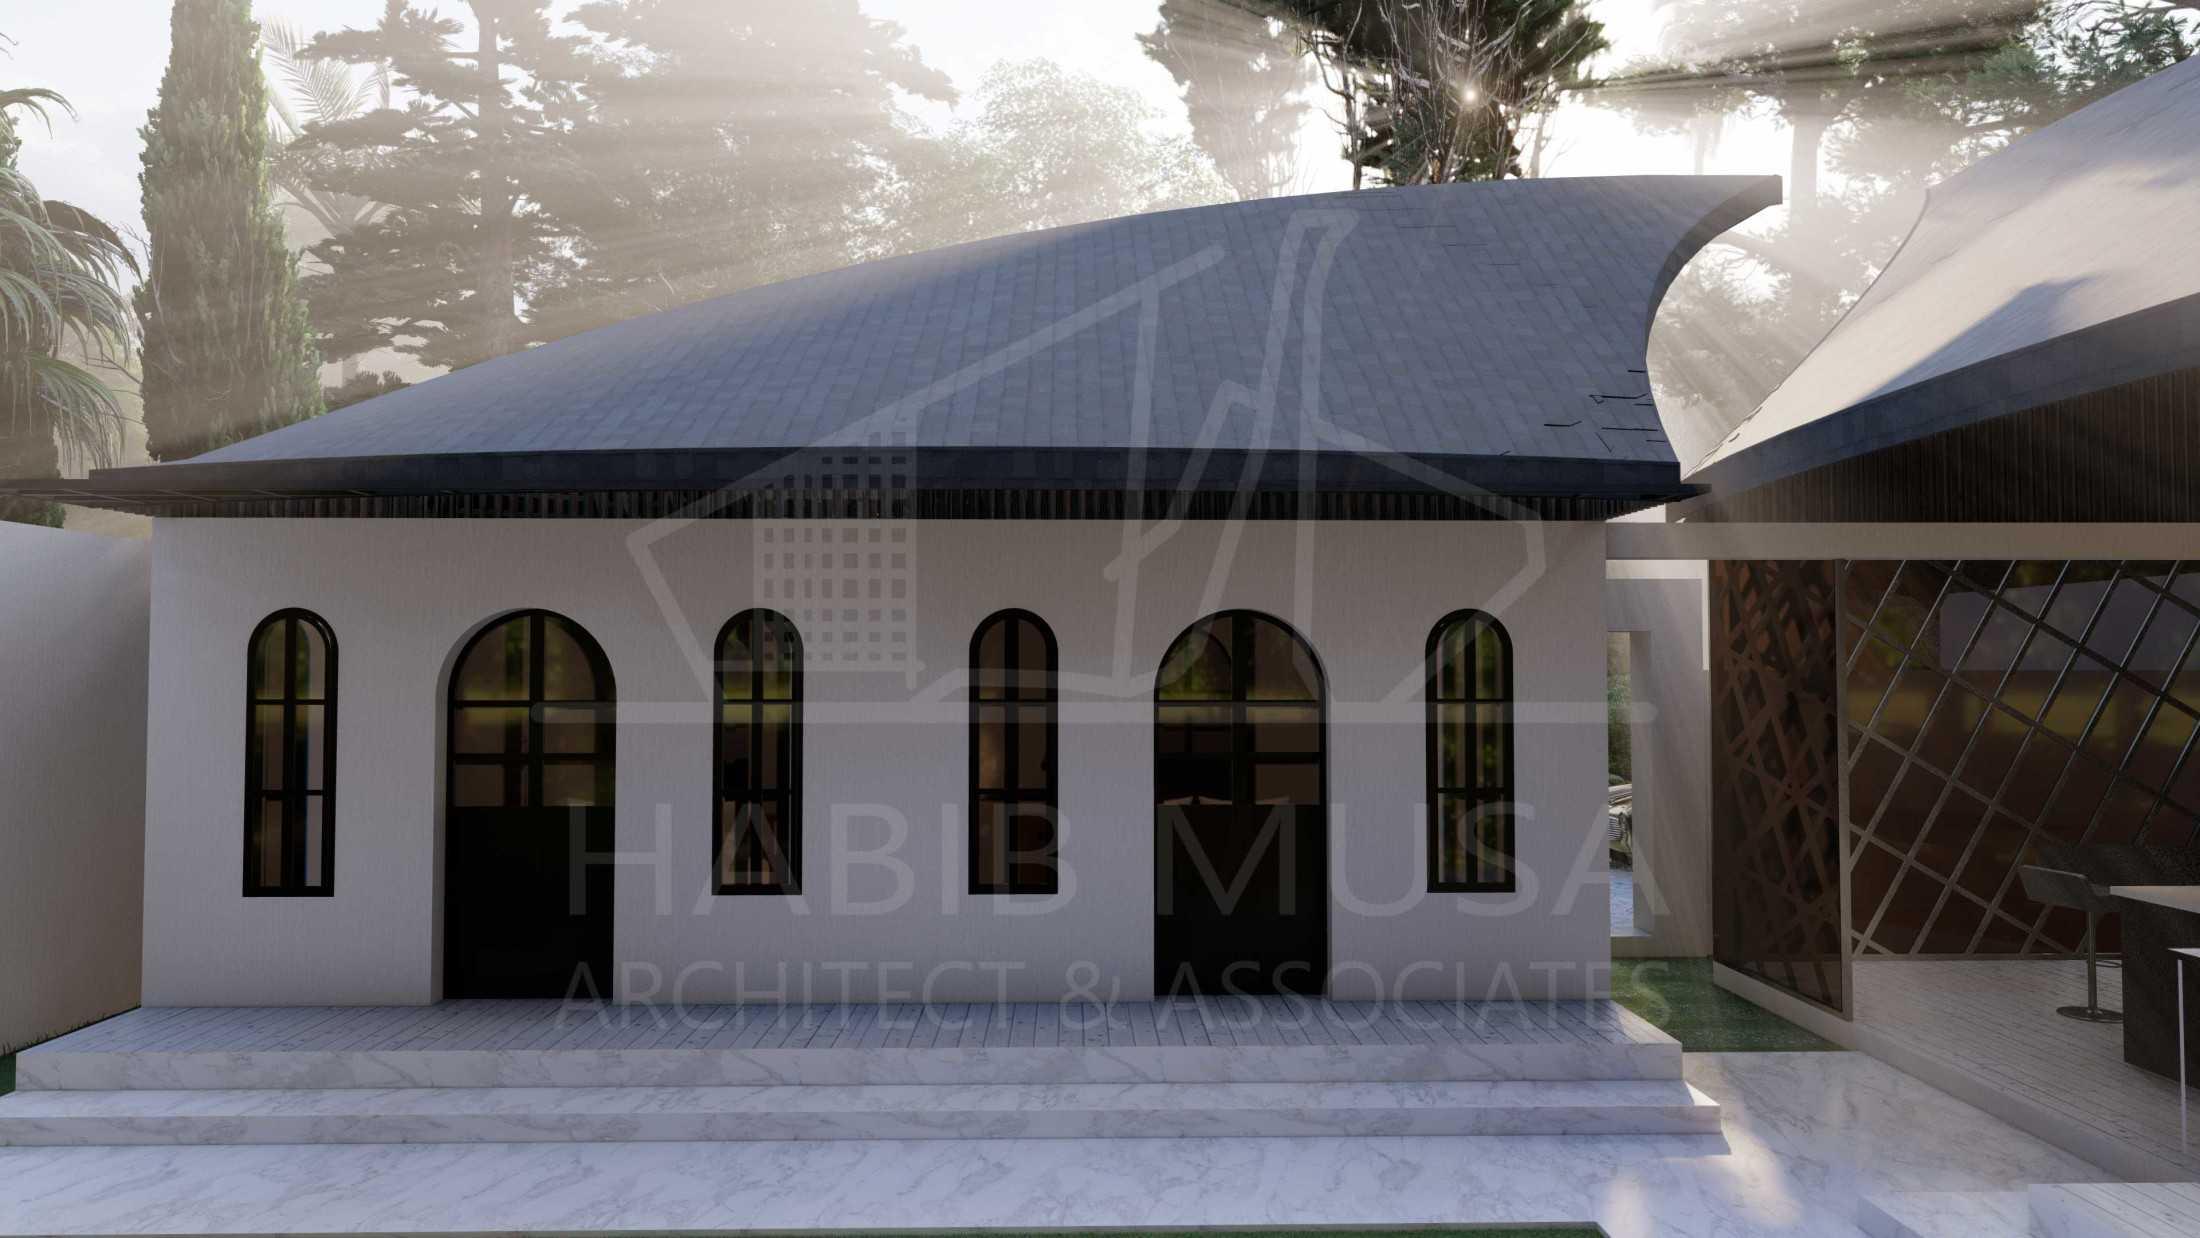 Habib Musa Architect and Associates di Badung